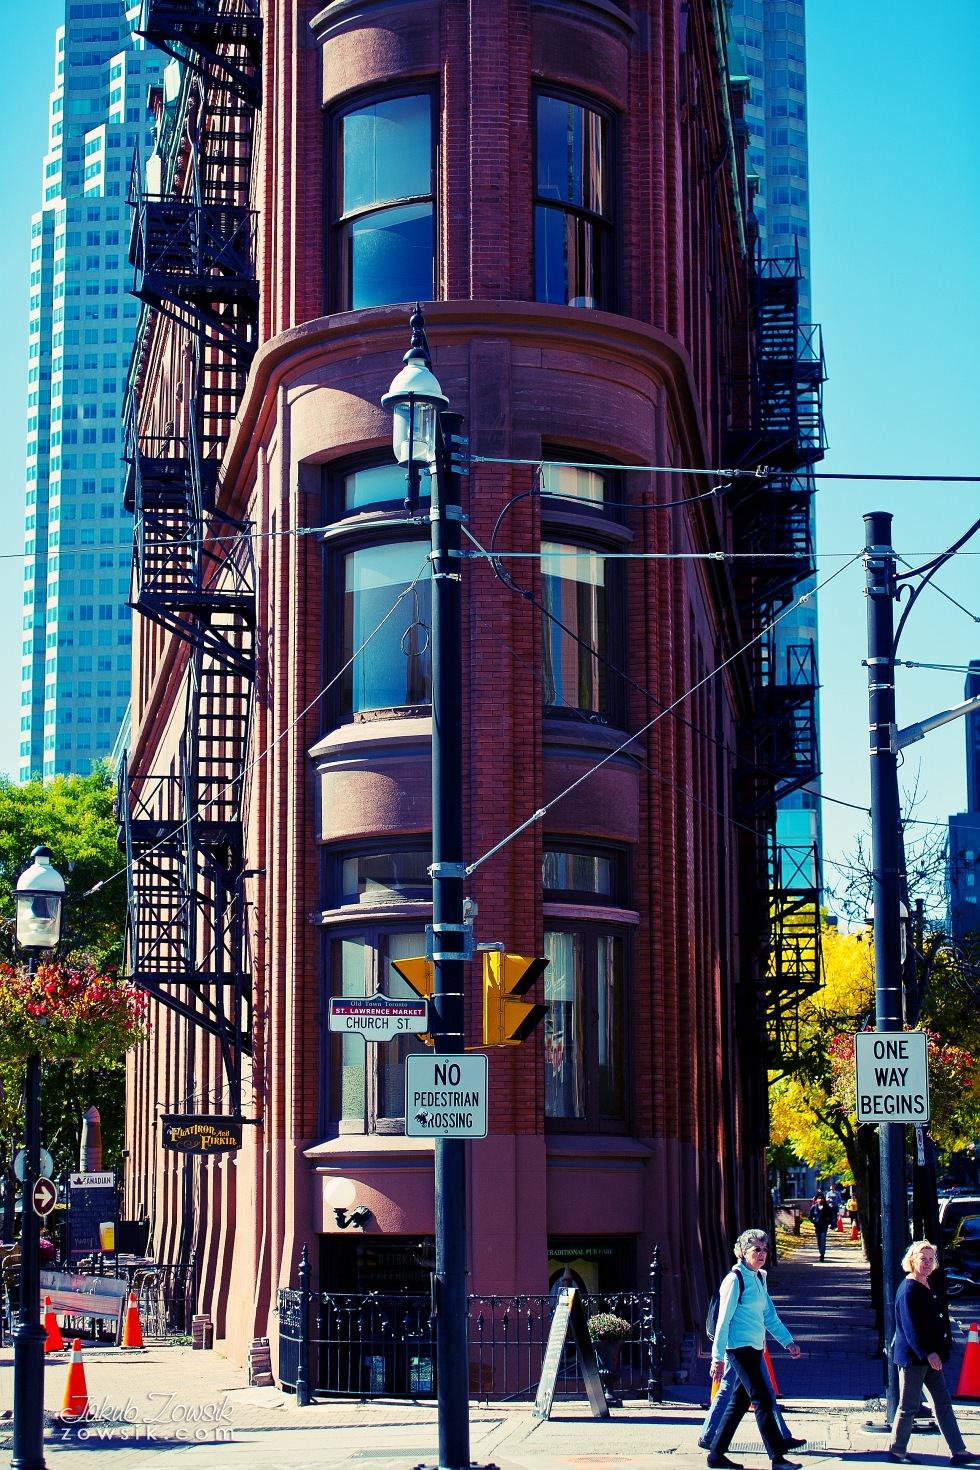 Toronto-picture-5dmk2-IMG_9726